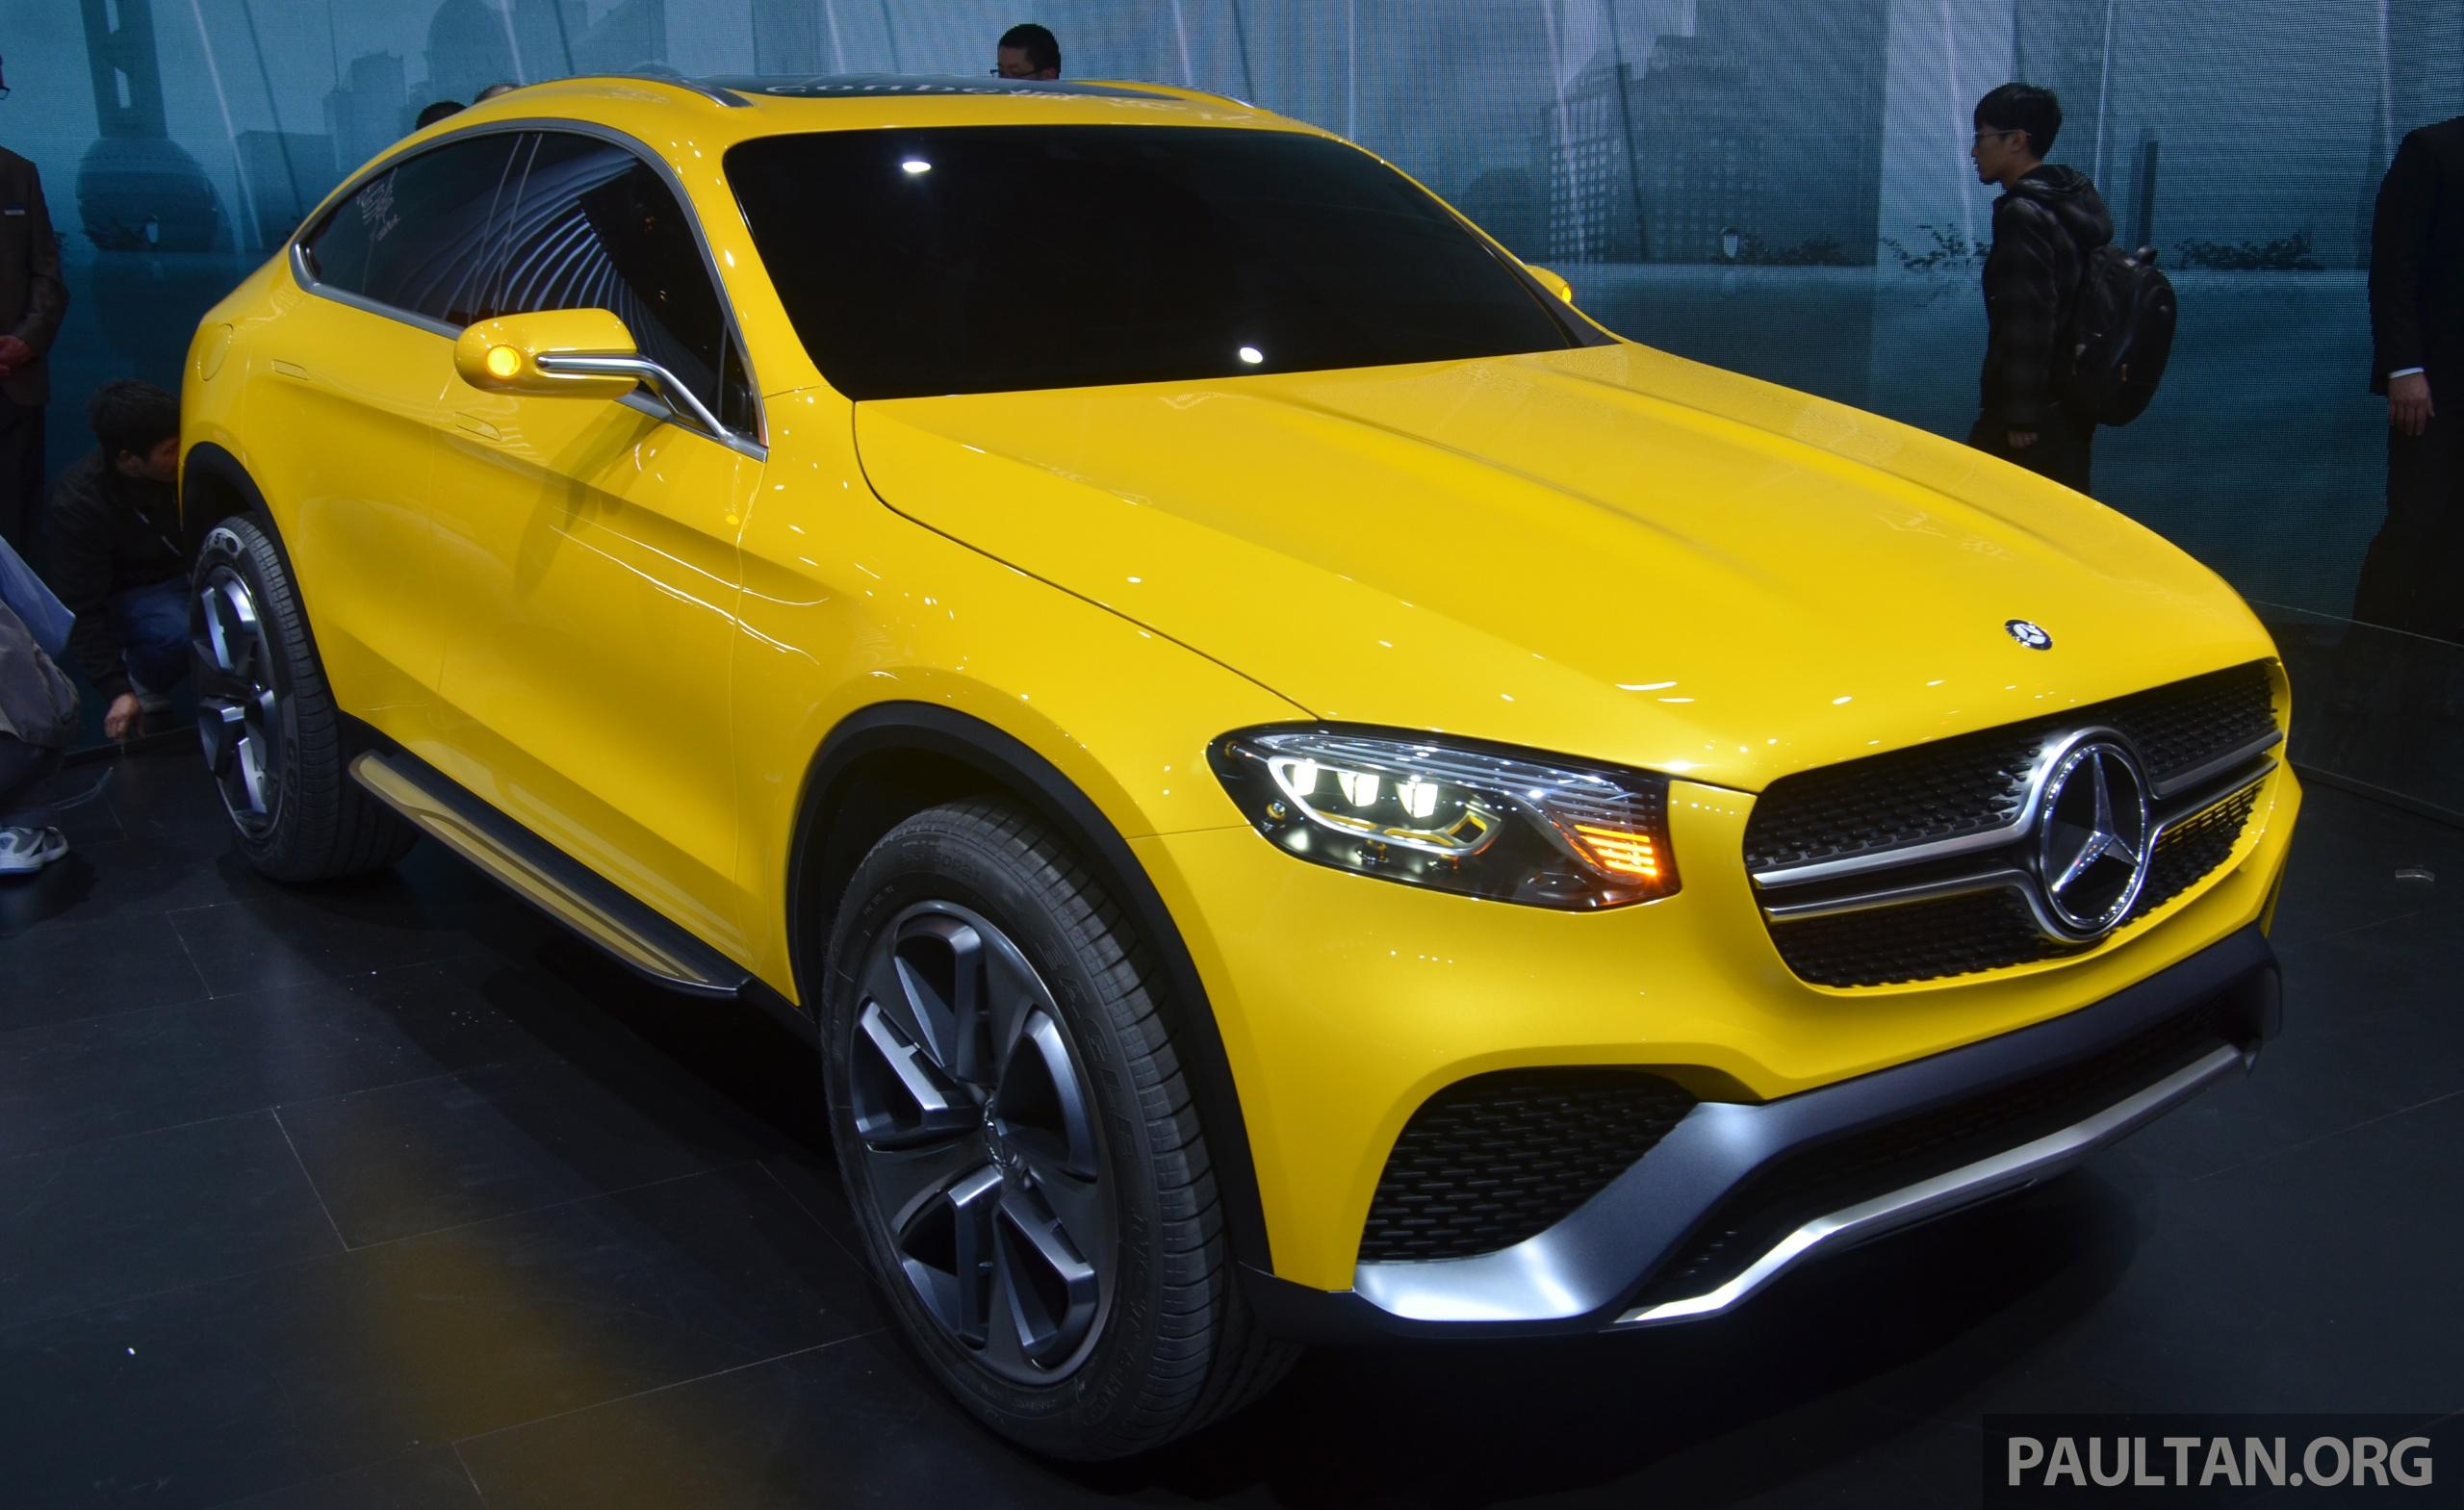 https://s2.paultan.org/image/2015/04/mercedes-benz-glc-coupe-concept-shanghai-1215.jpg